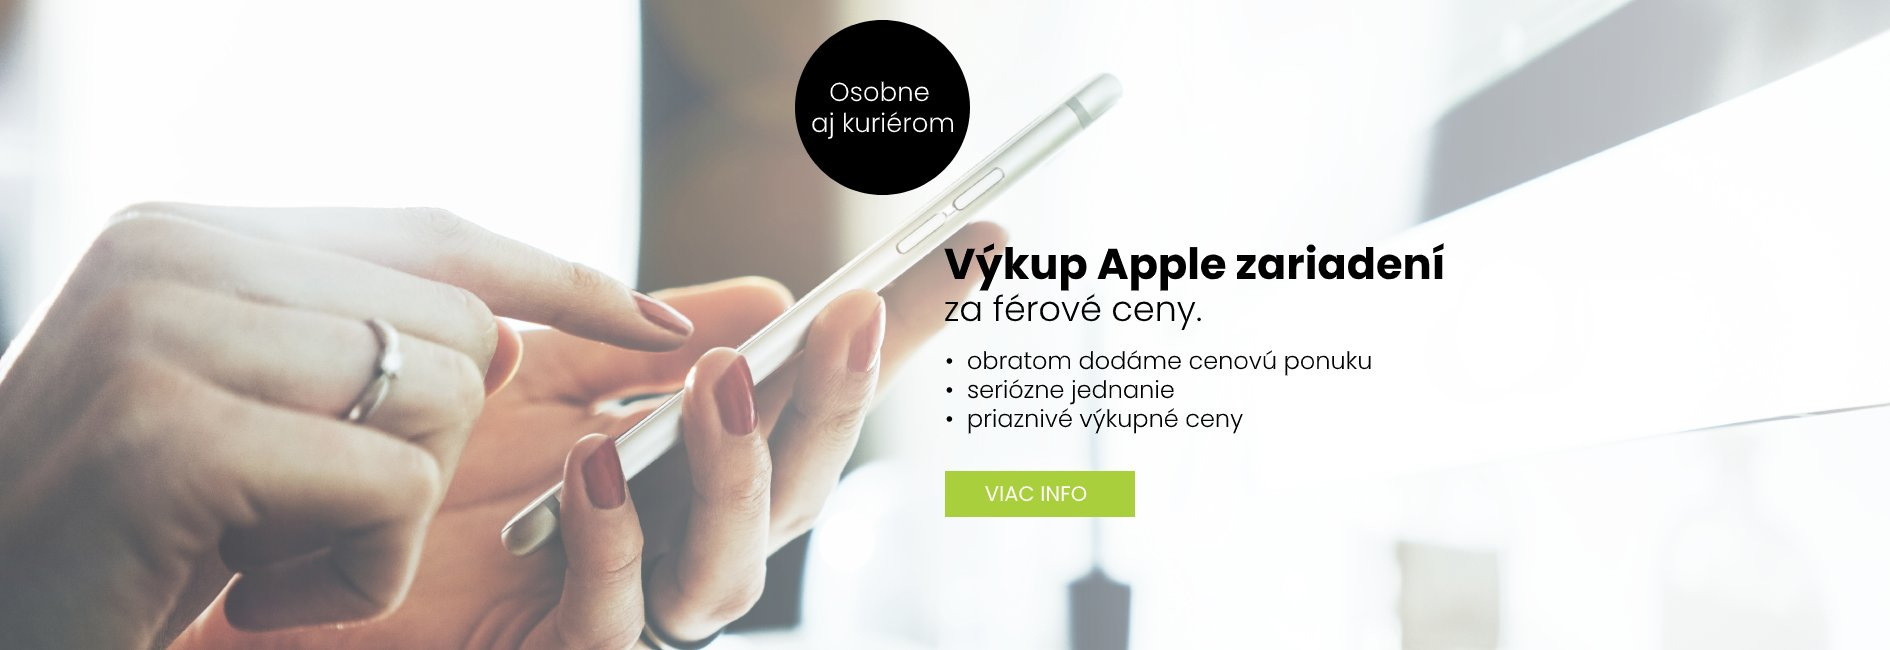 Výkup mobilov značky Apple